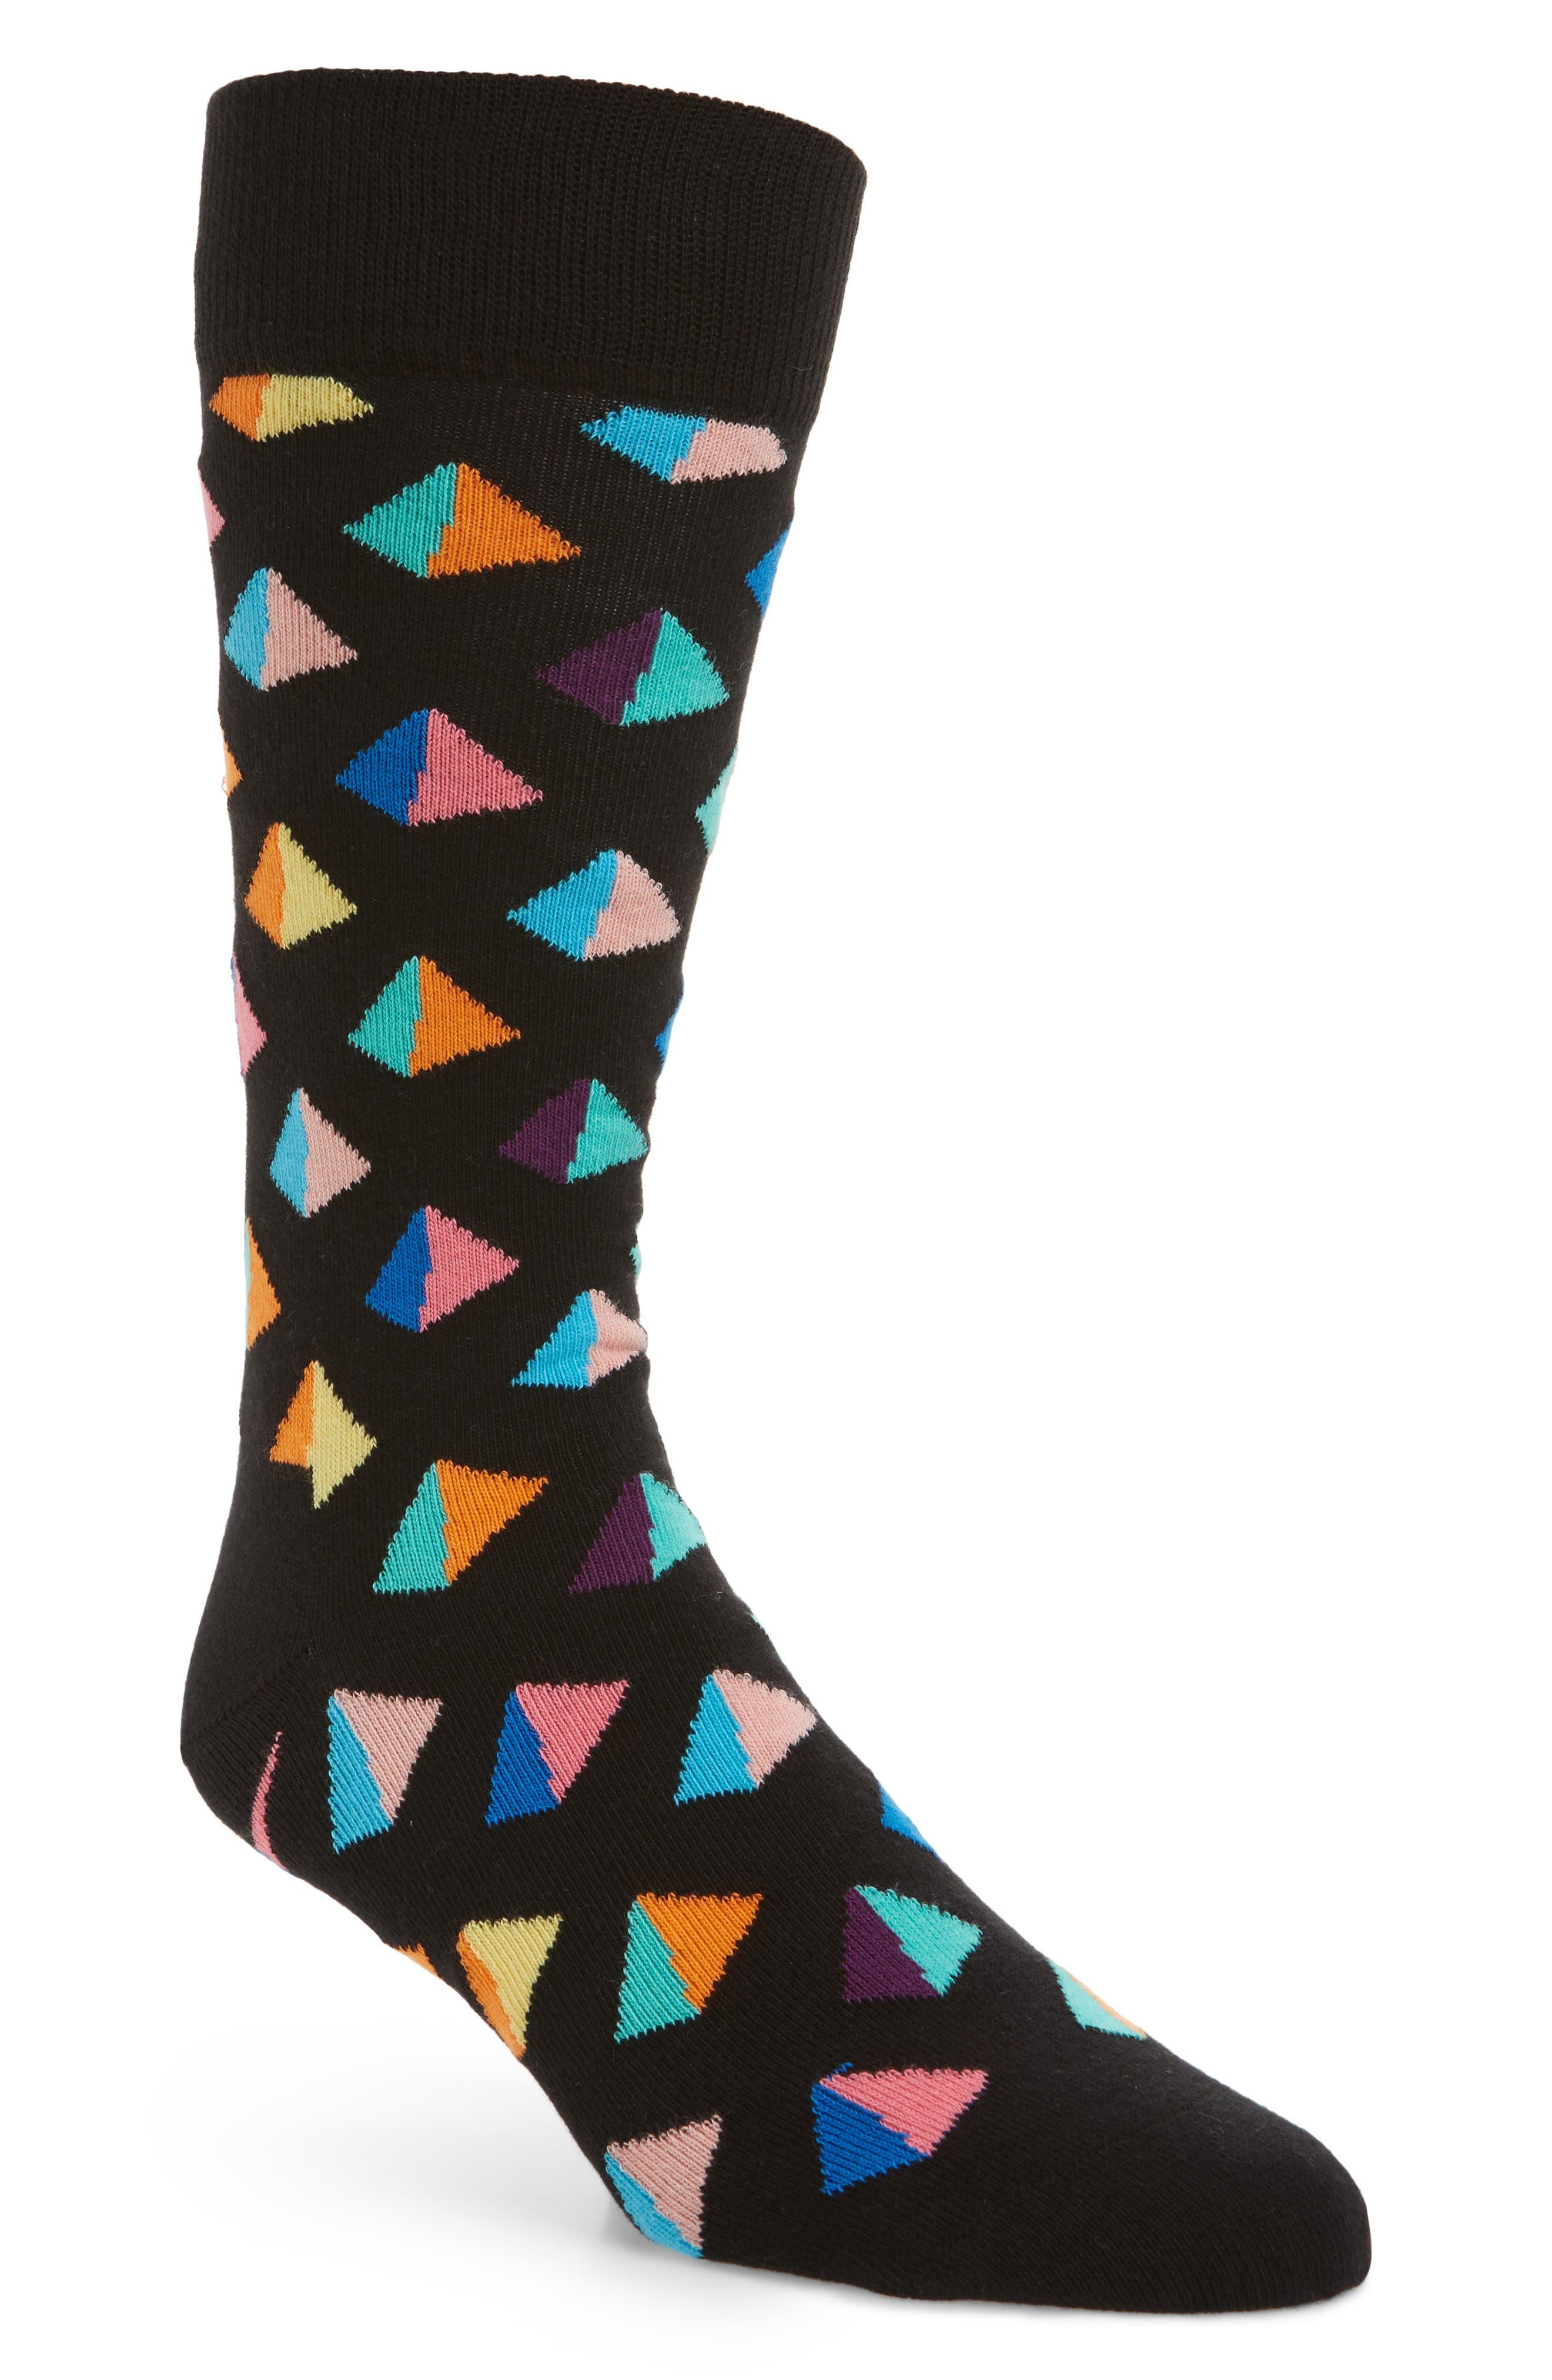 Pyramid Socks,                             Main thumbnail 1, color,                             Black Multi